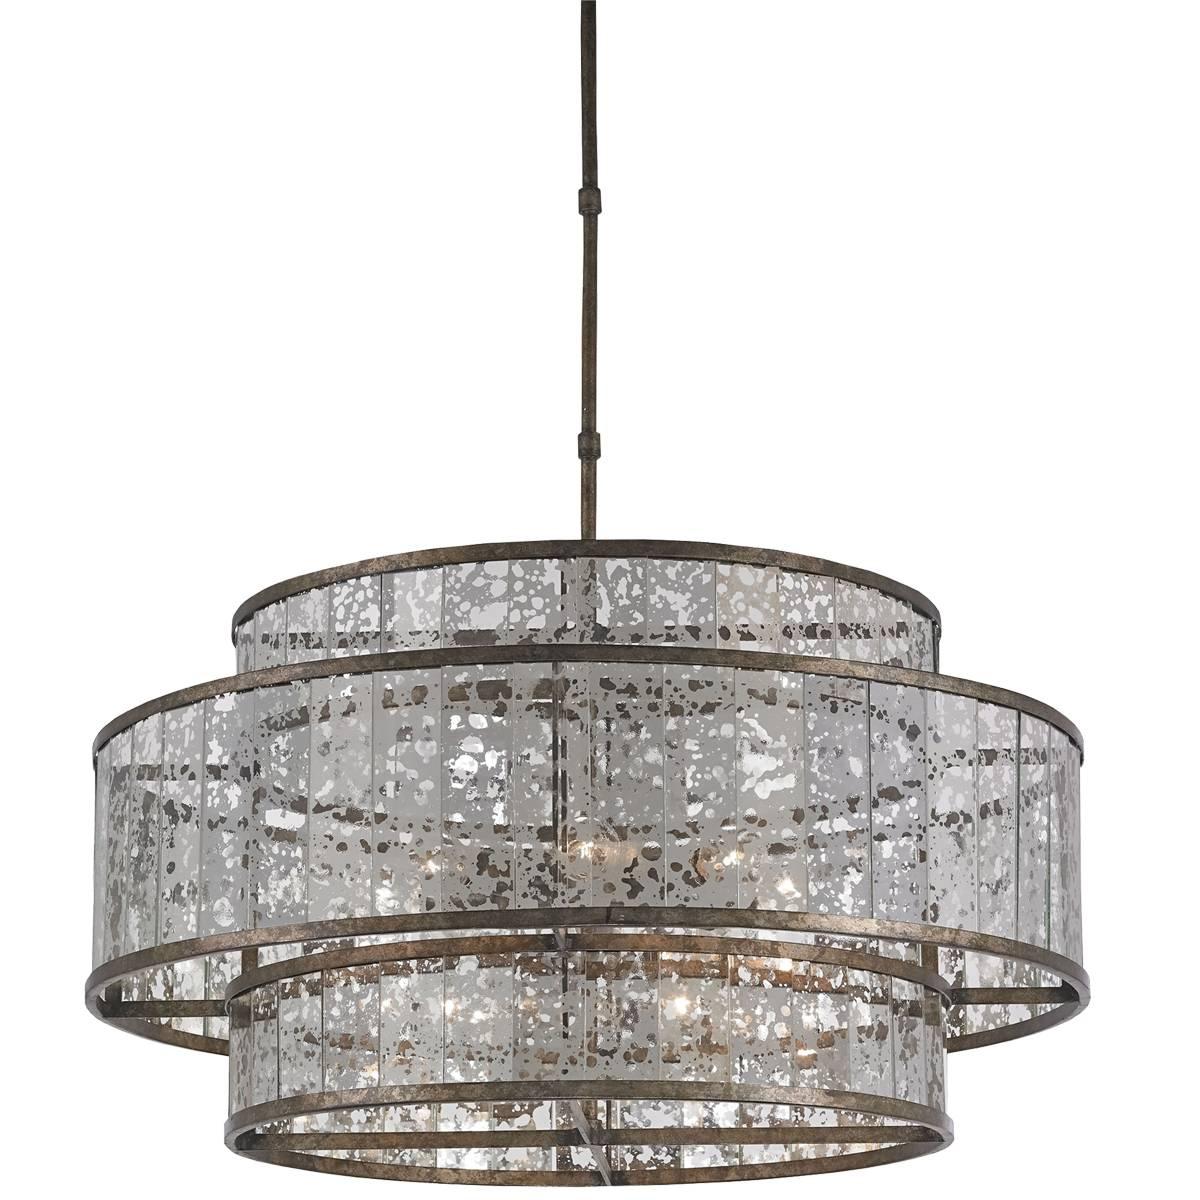 Chandelier: Unique Mercury Glass Light Fixtures | Terrific Mercury in Mercury Glass Lights Fixtures (Image 5 of 15)